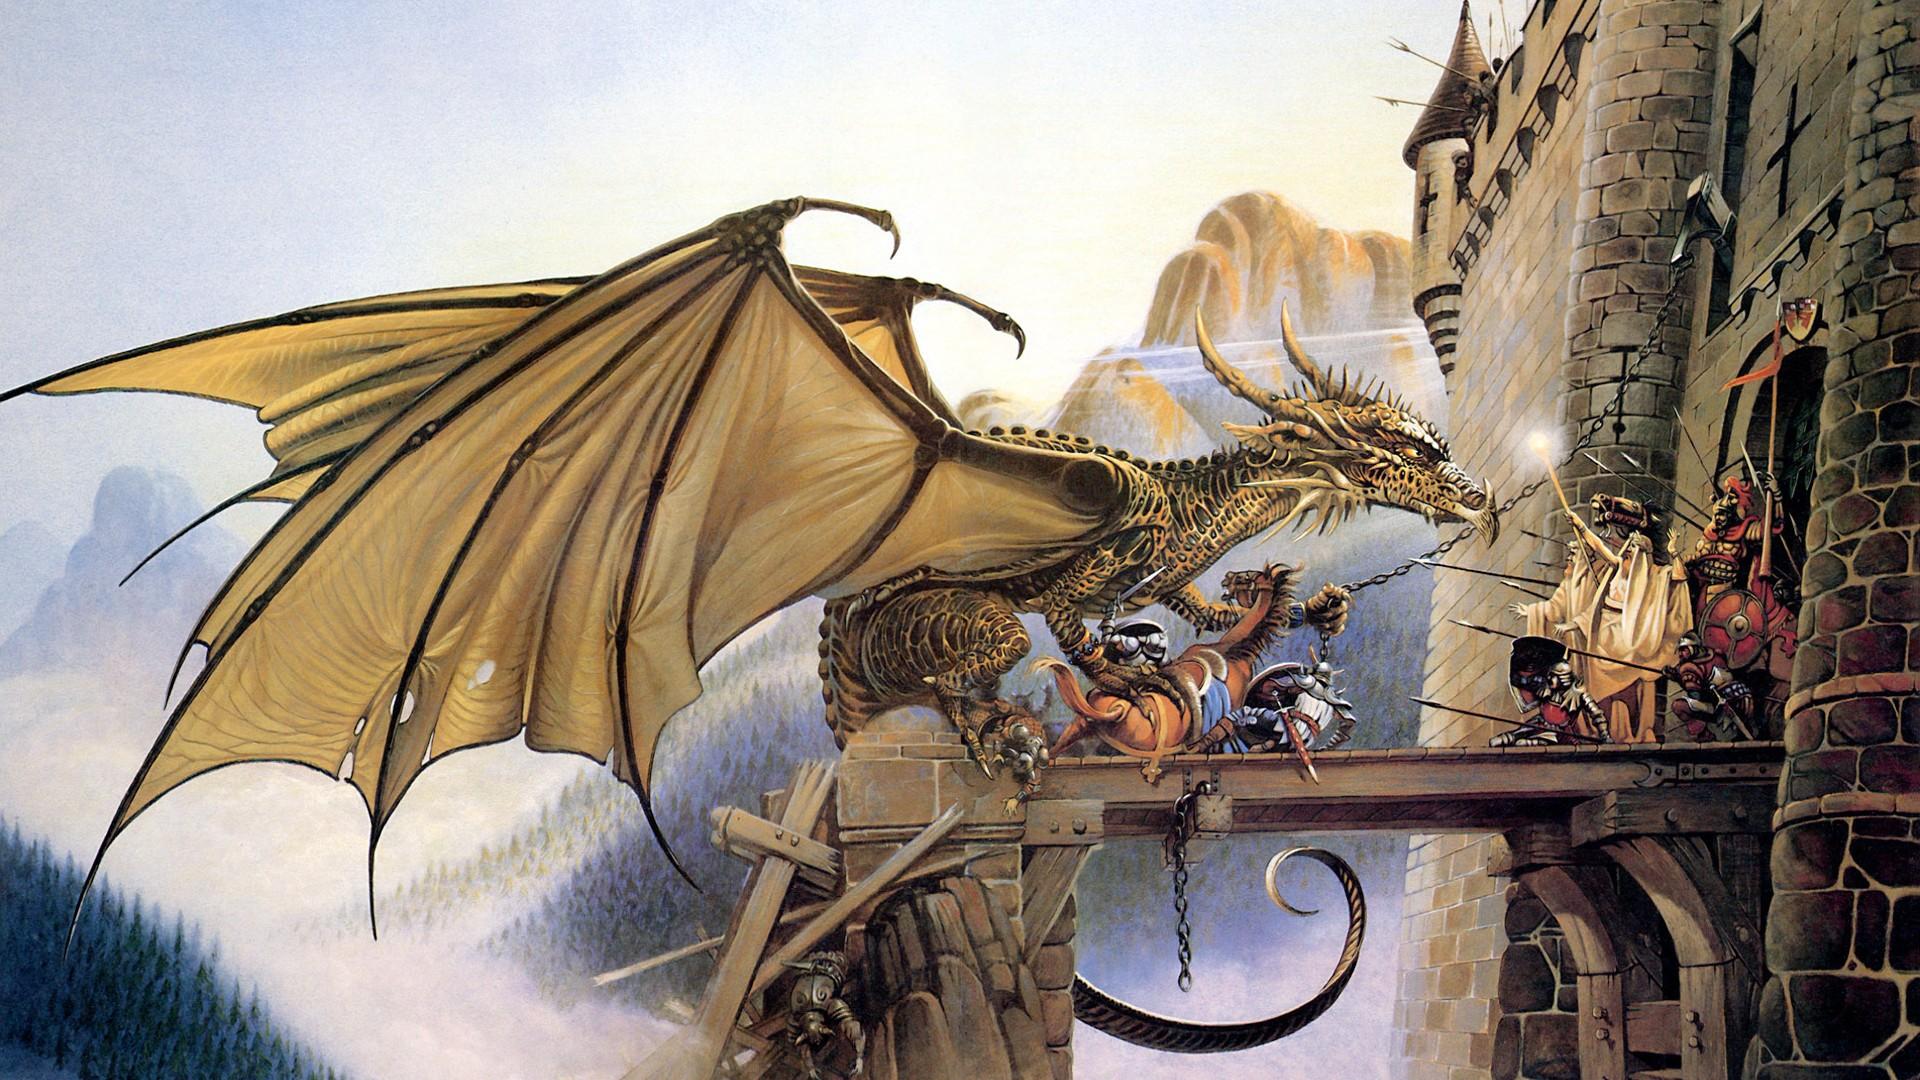 Картинка дракон над замком